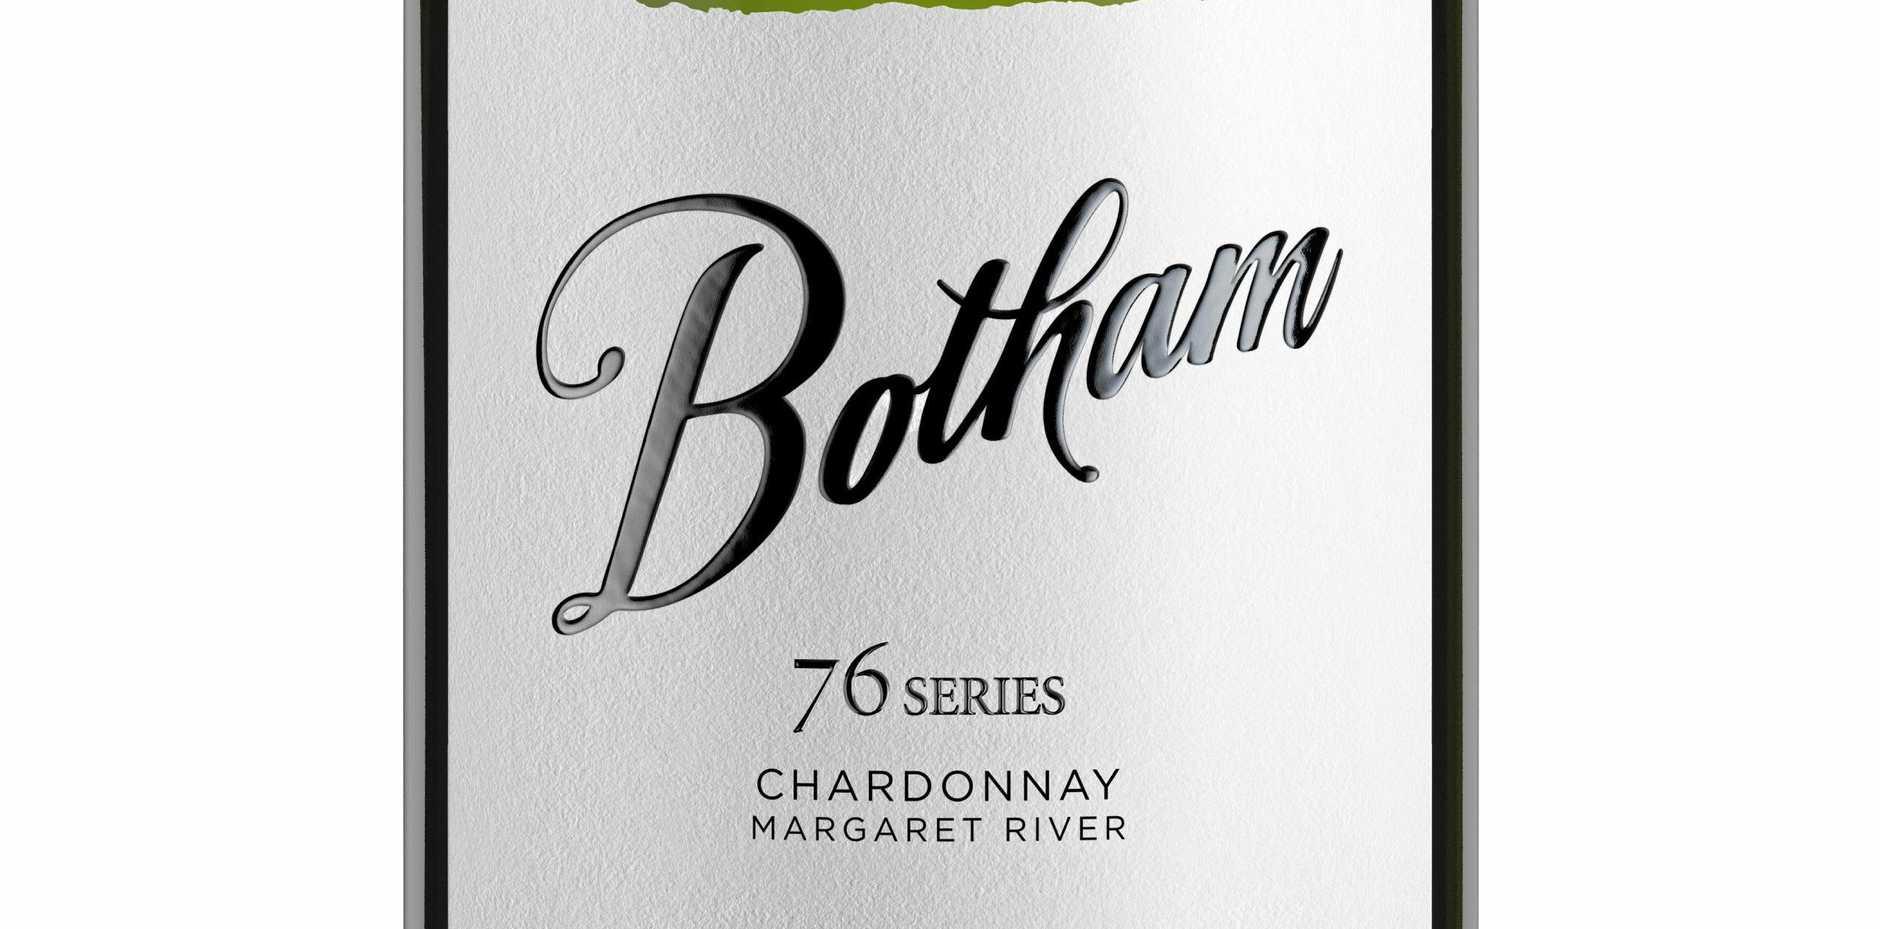 Botham series chardonnay.